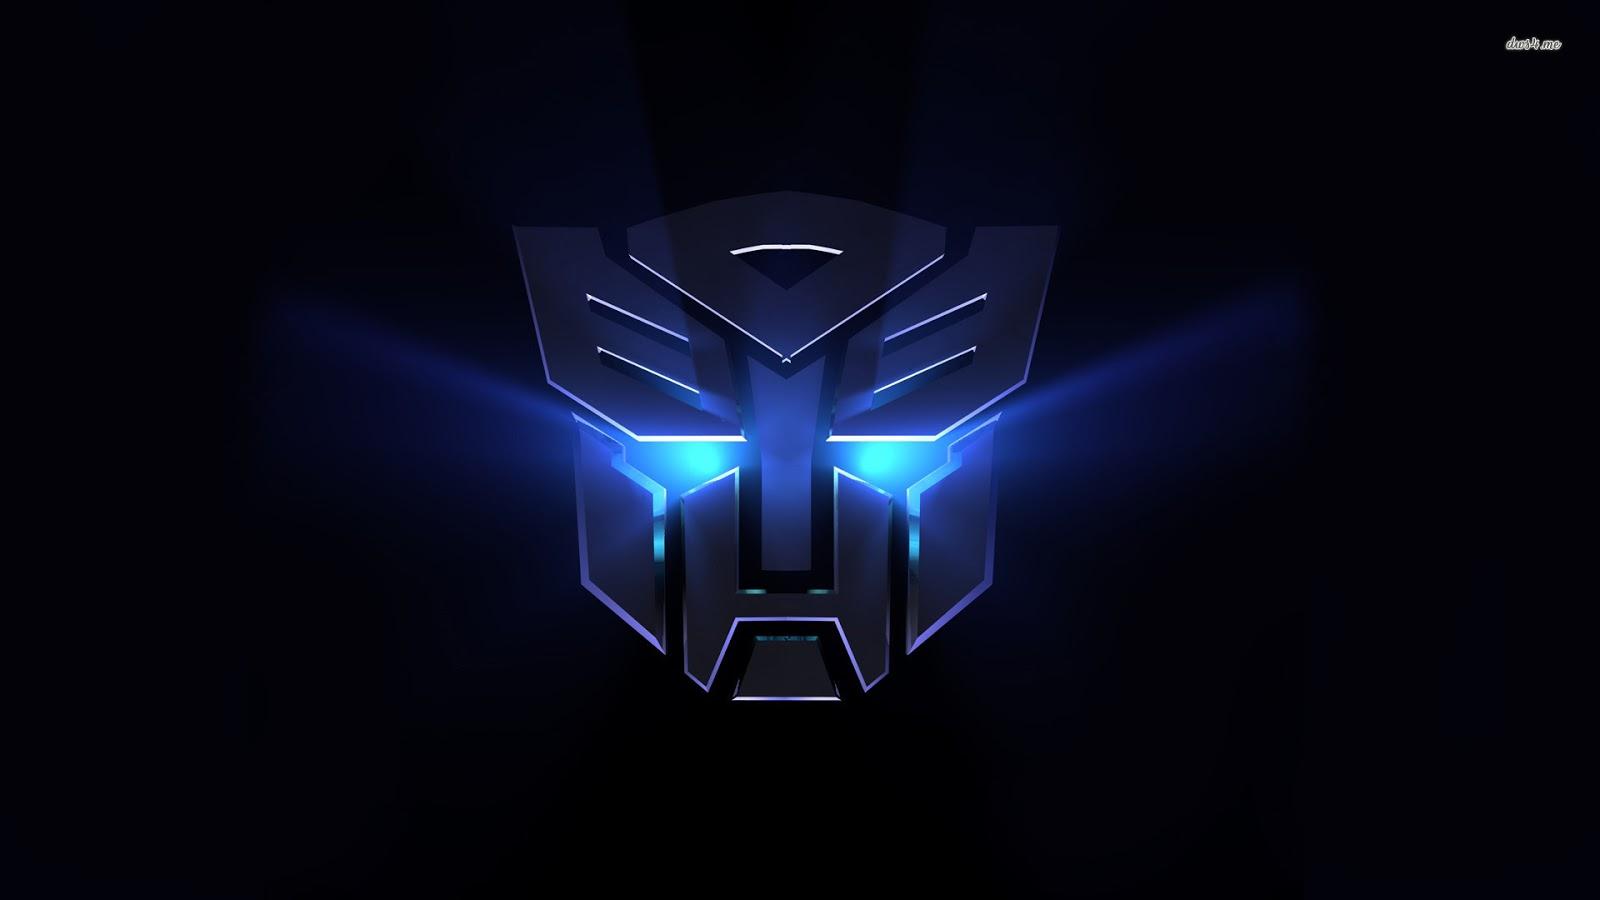 Transformers Autobots Wallpaper Logo Down 2502 Wallpaper 1600x900